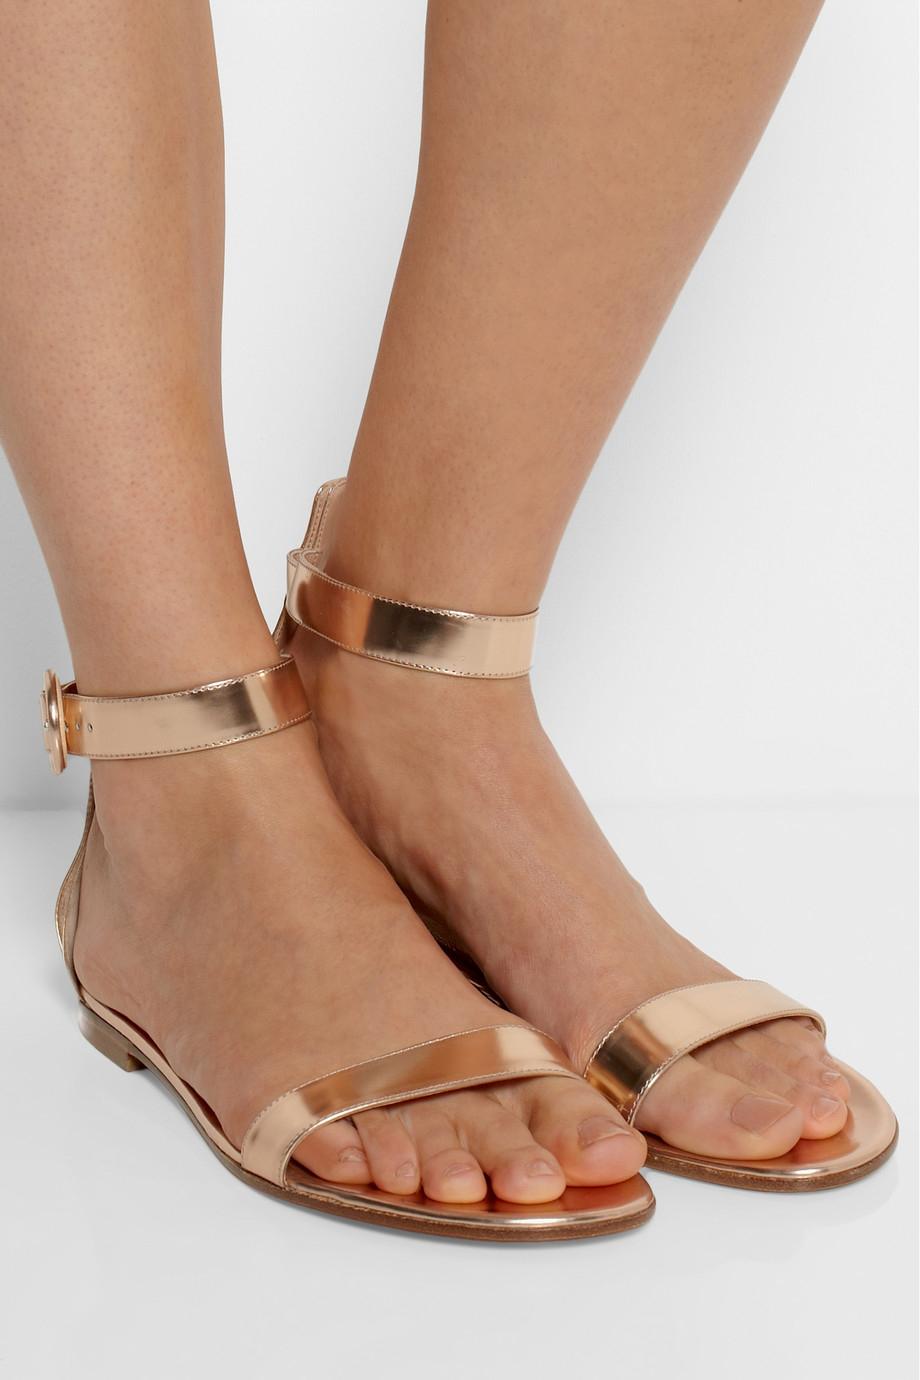 Gianvito Rossi Metallic Leather Sandals In Metallic Lyst